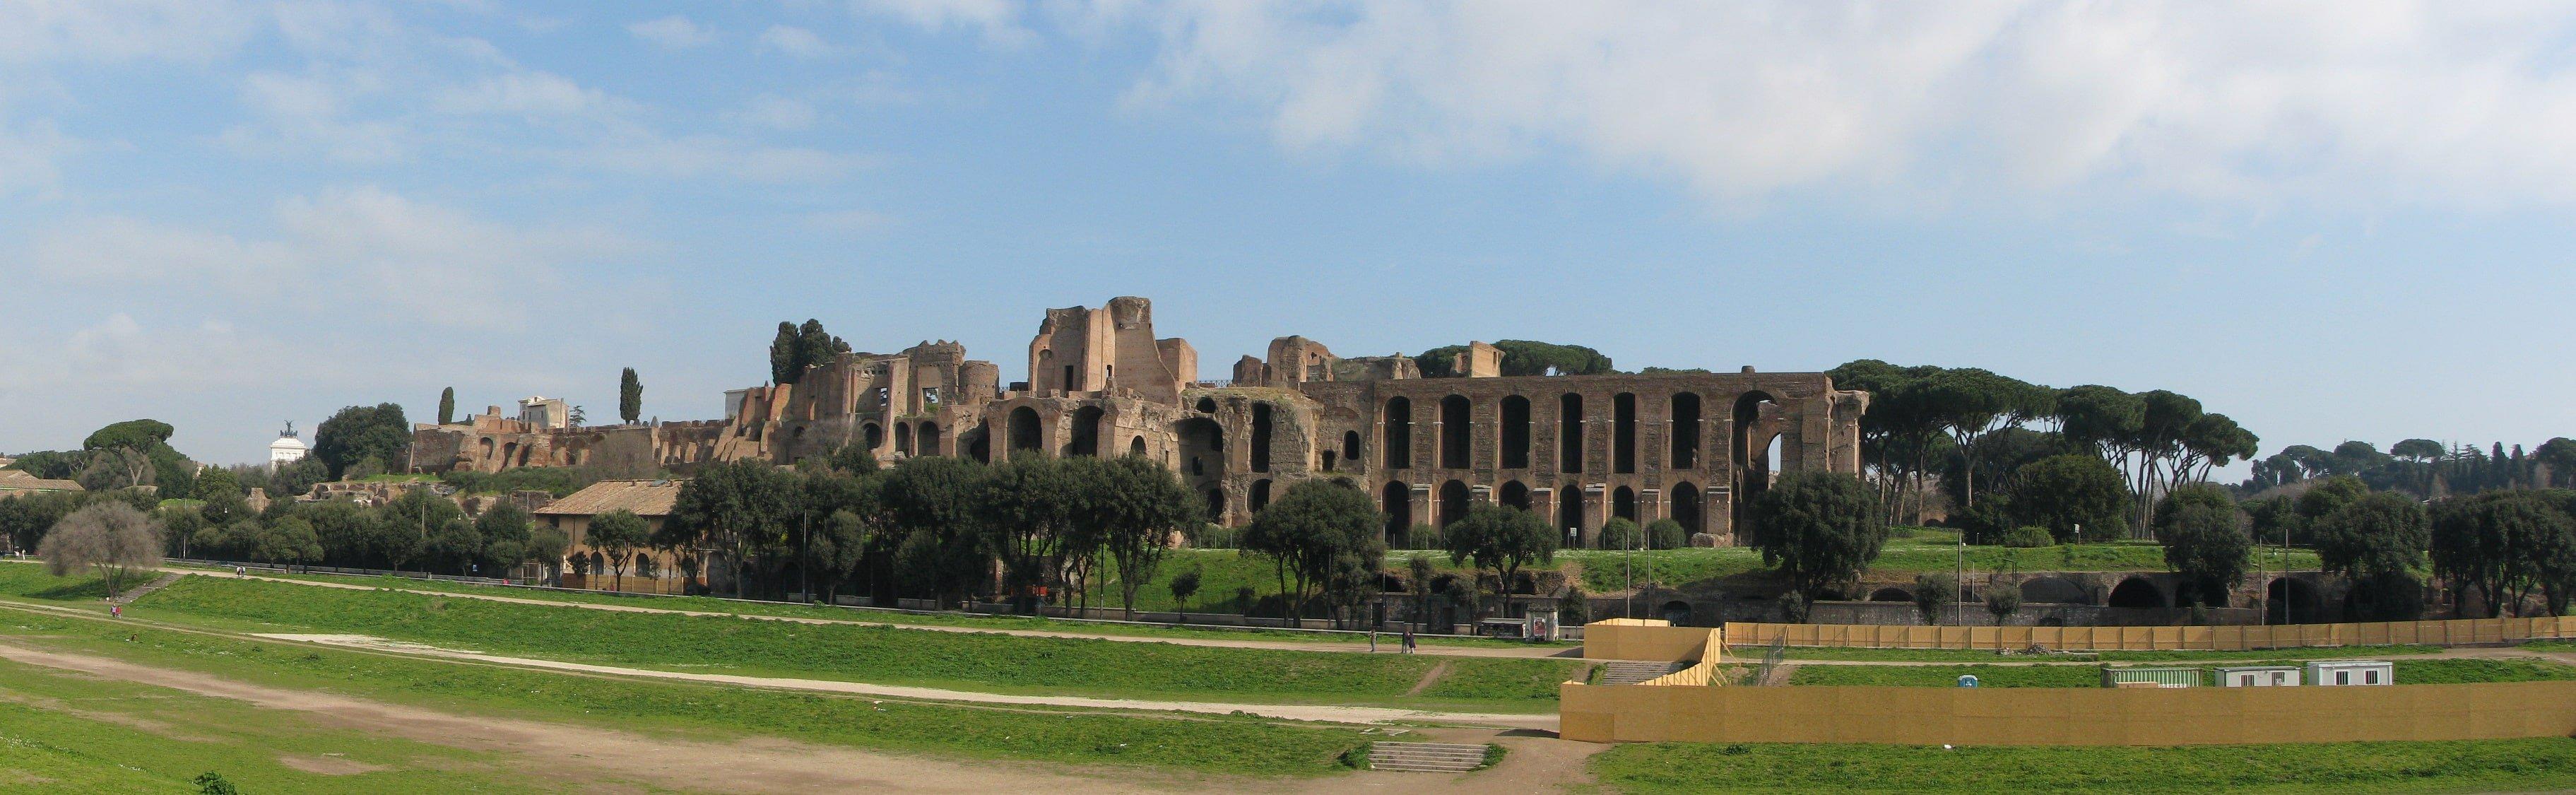 Circus Maximus tickets Palatine Hill Rome Panorama